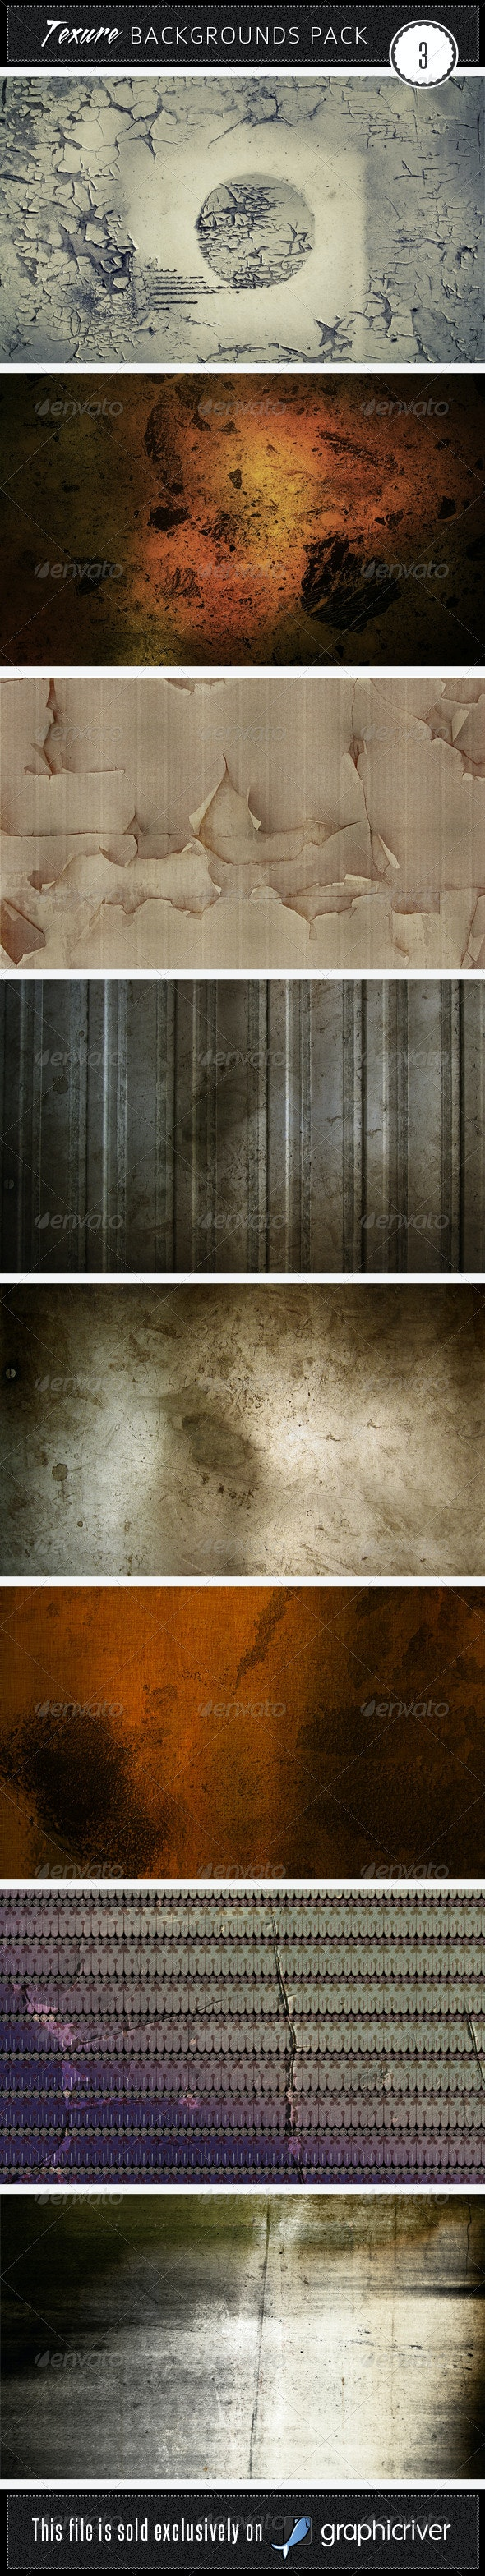 Texture Backgrounds Pack 3 - Miscellaneous Textures